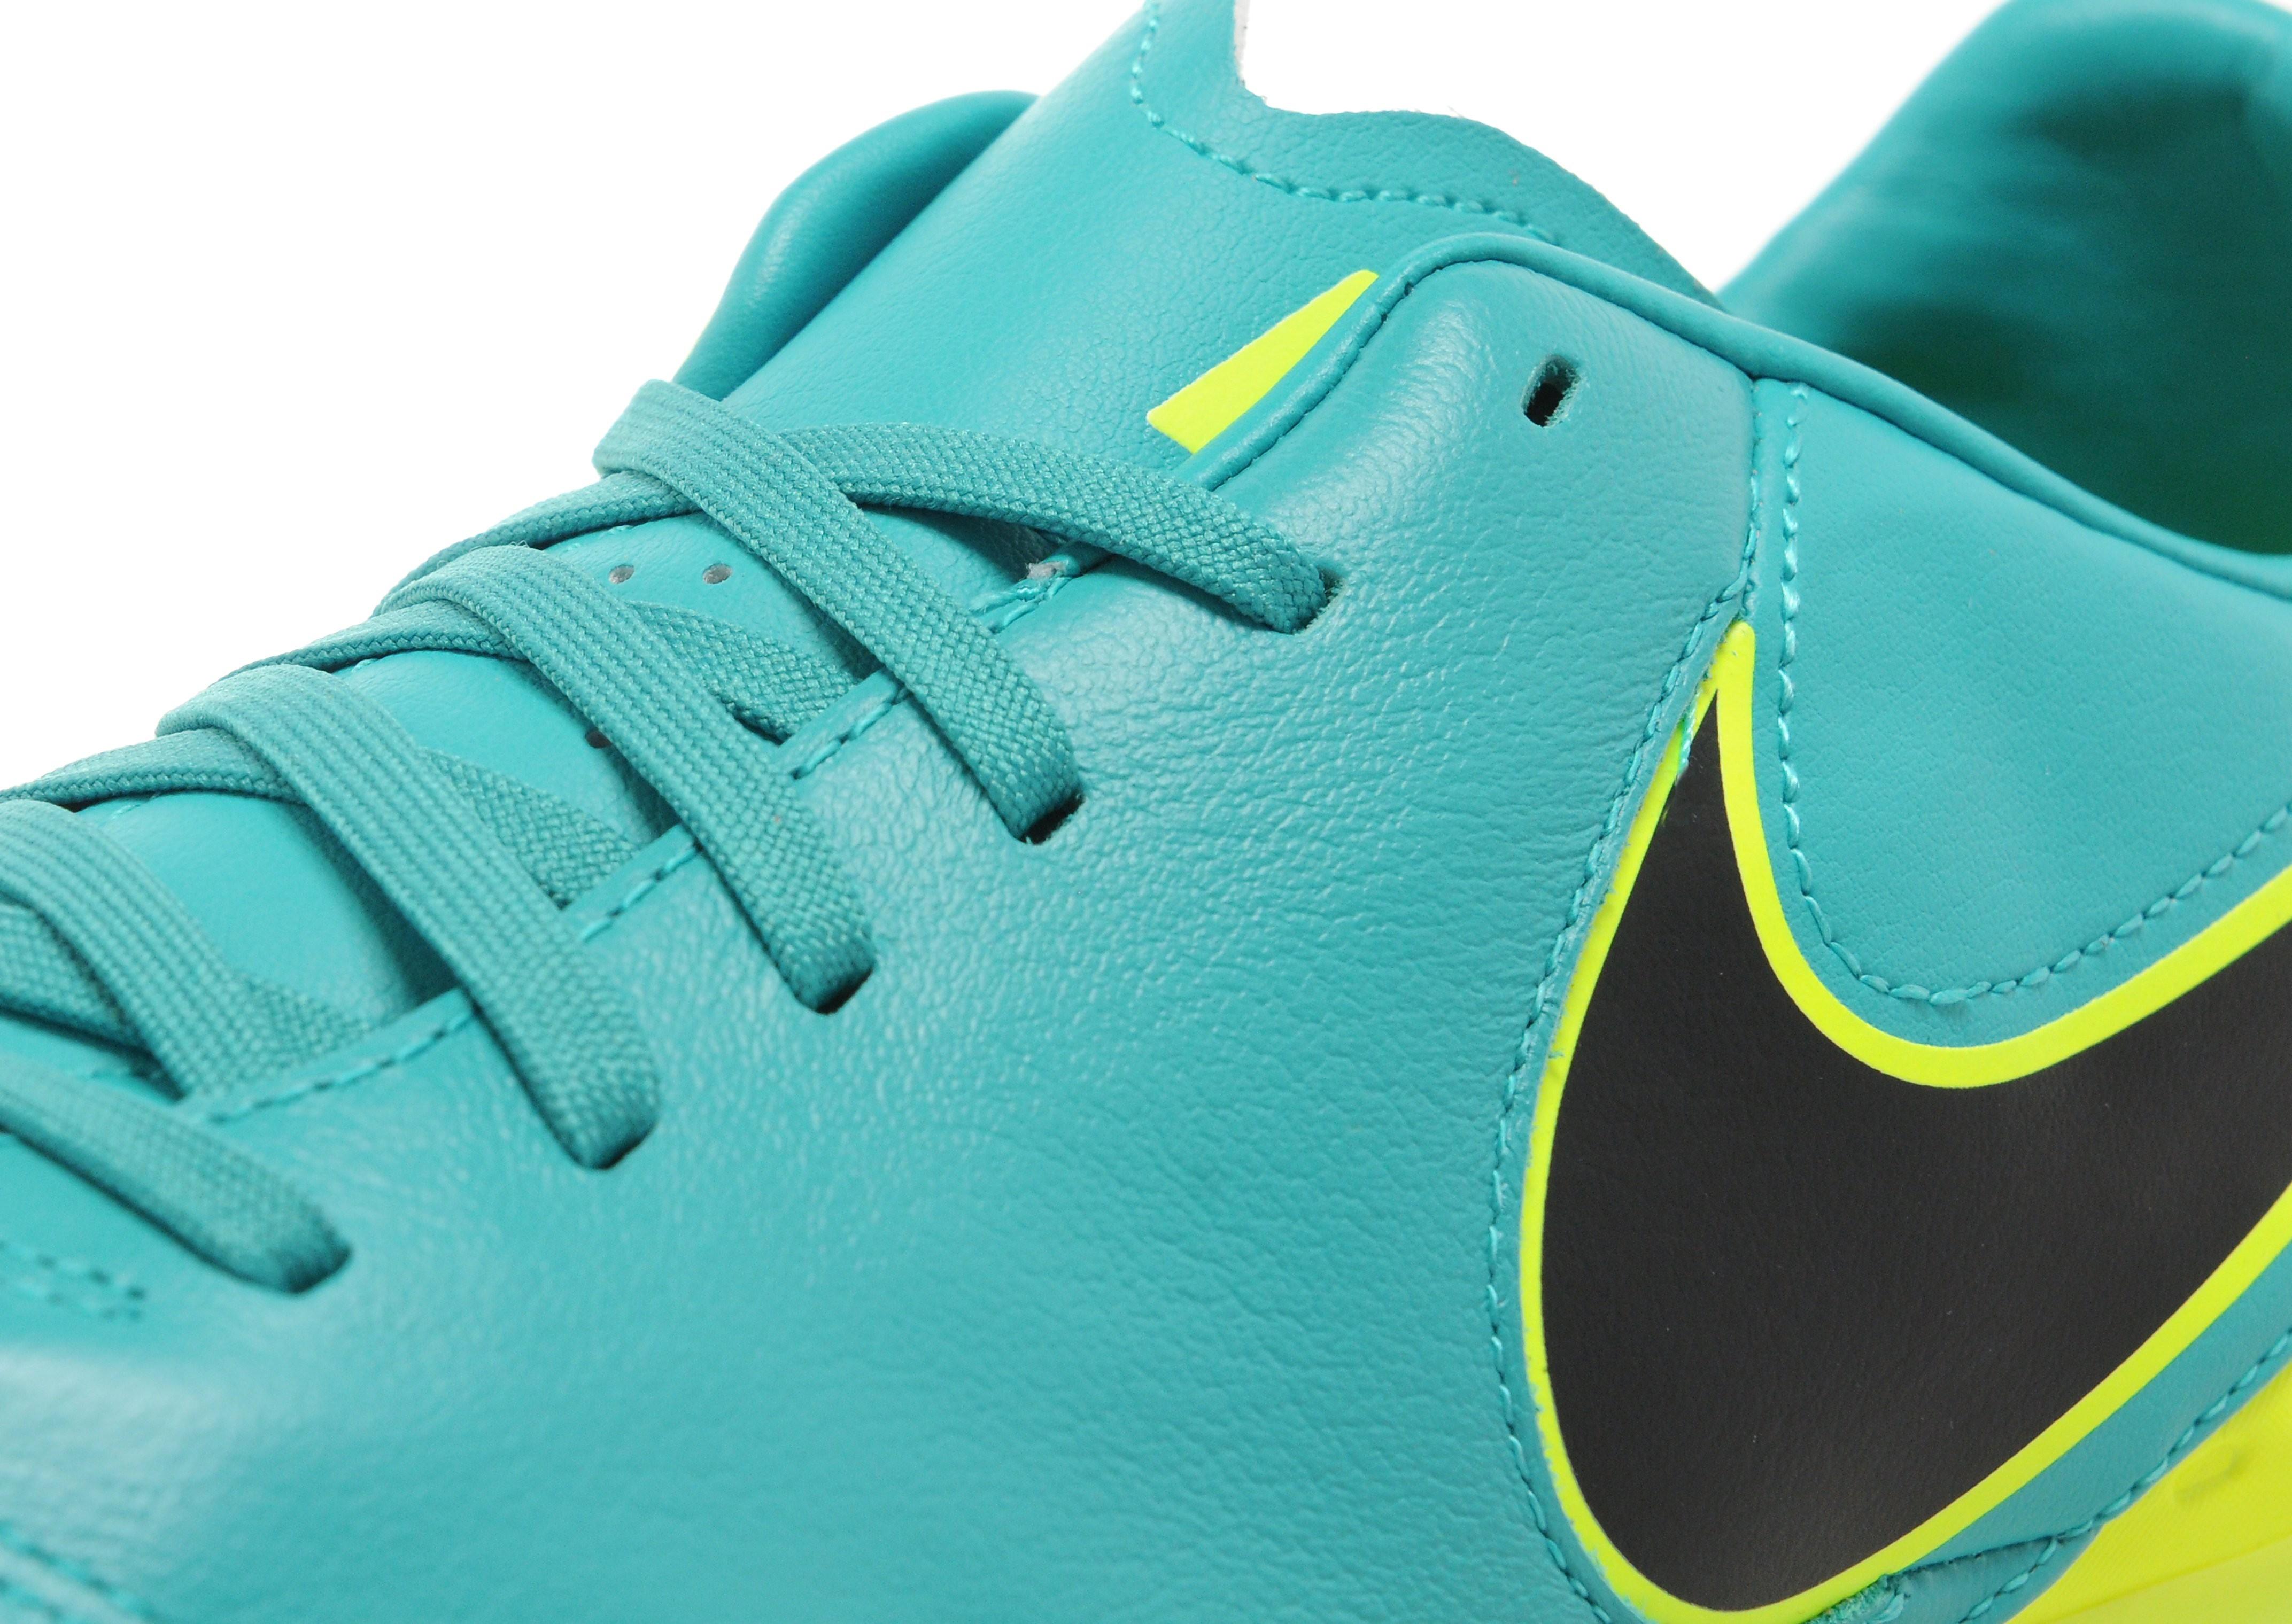 Nike Spark Brilliance Tiempo Mystic Firm Ground